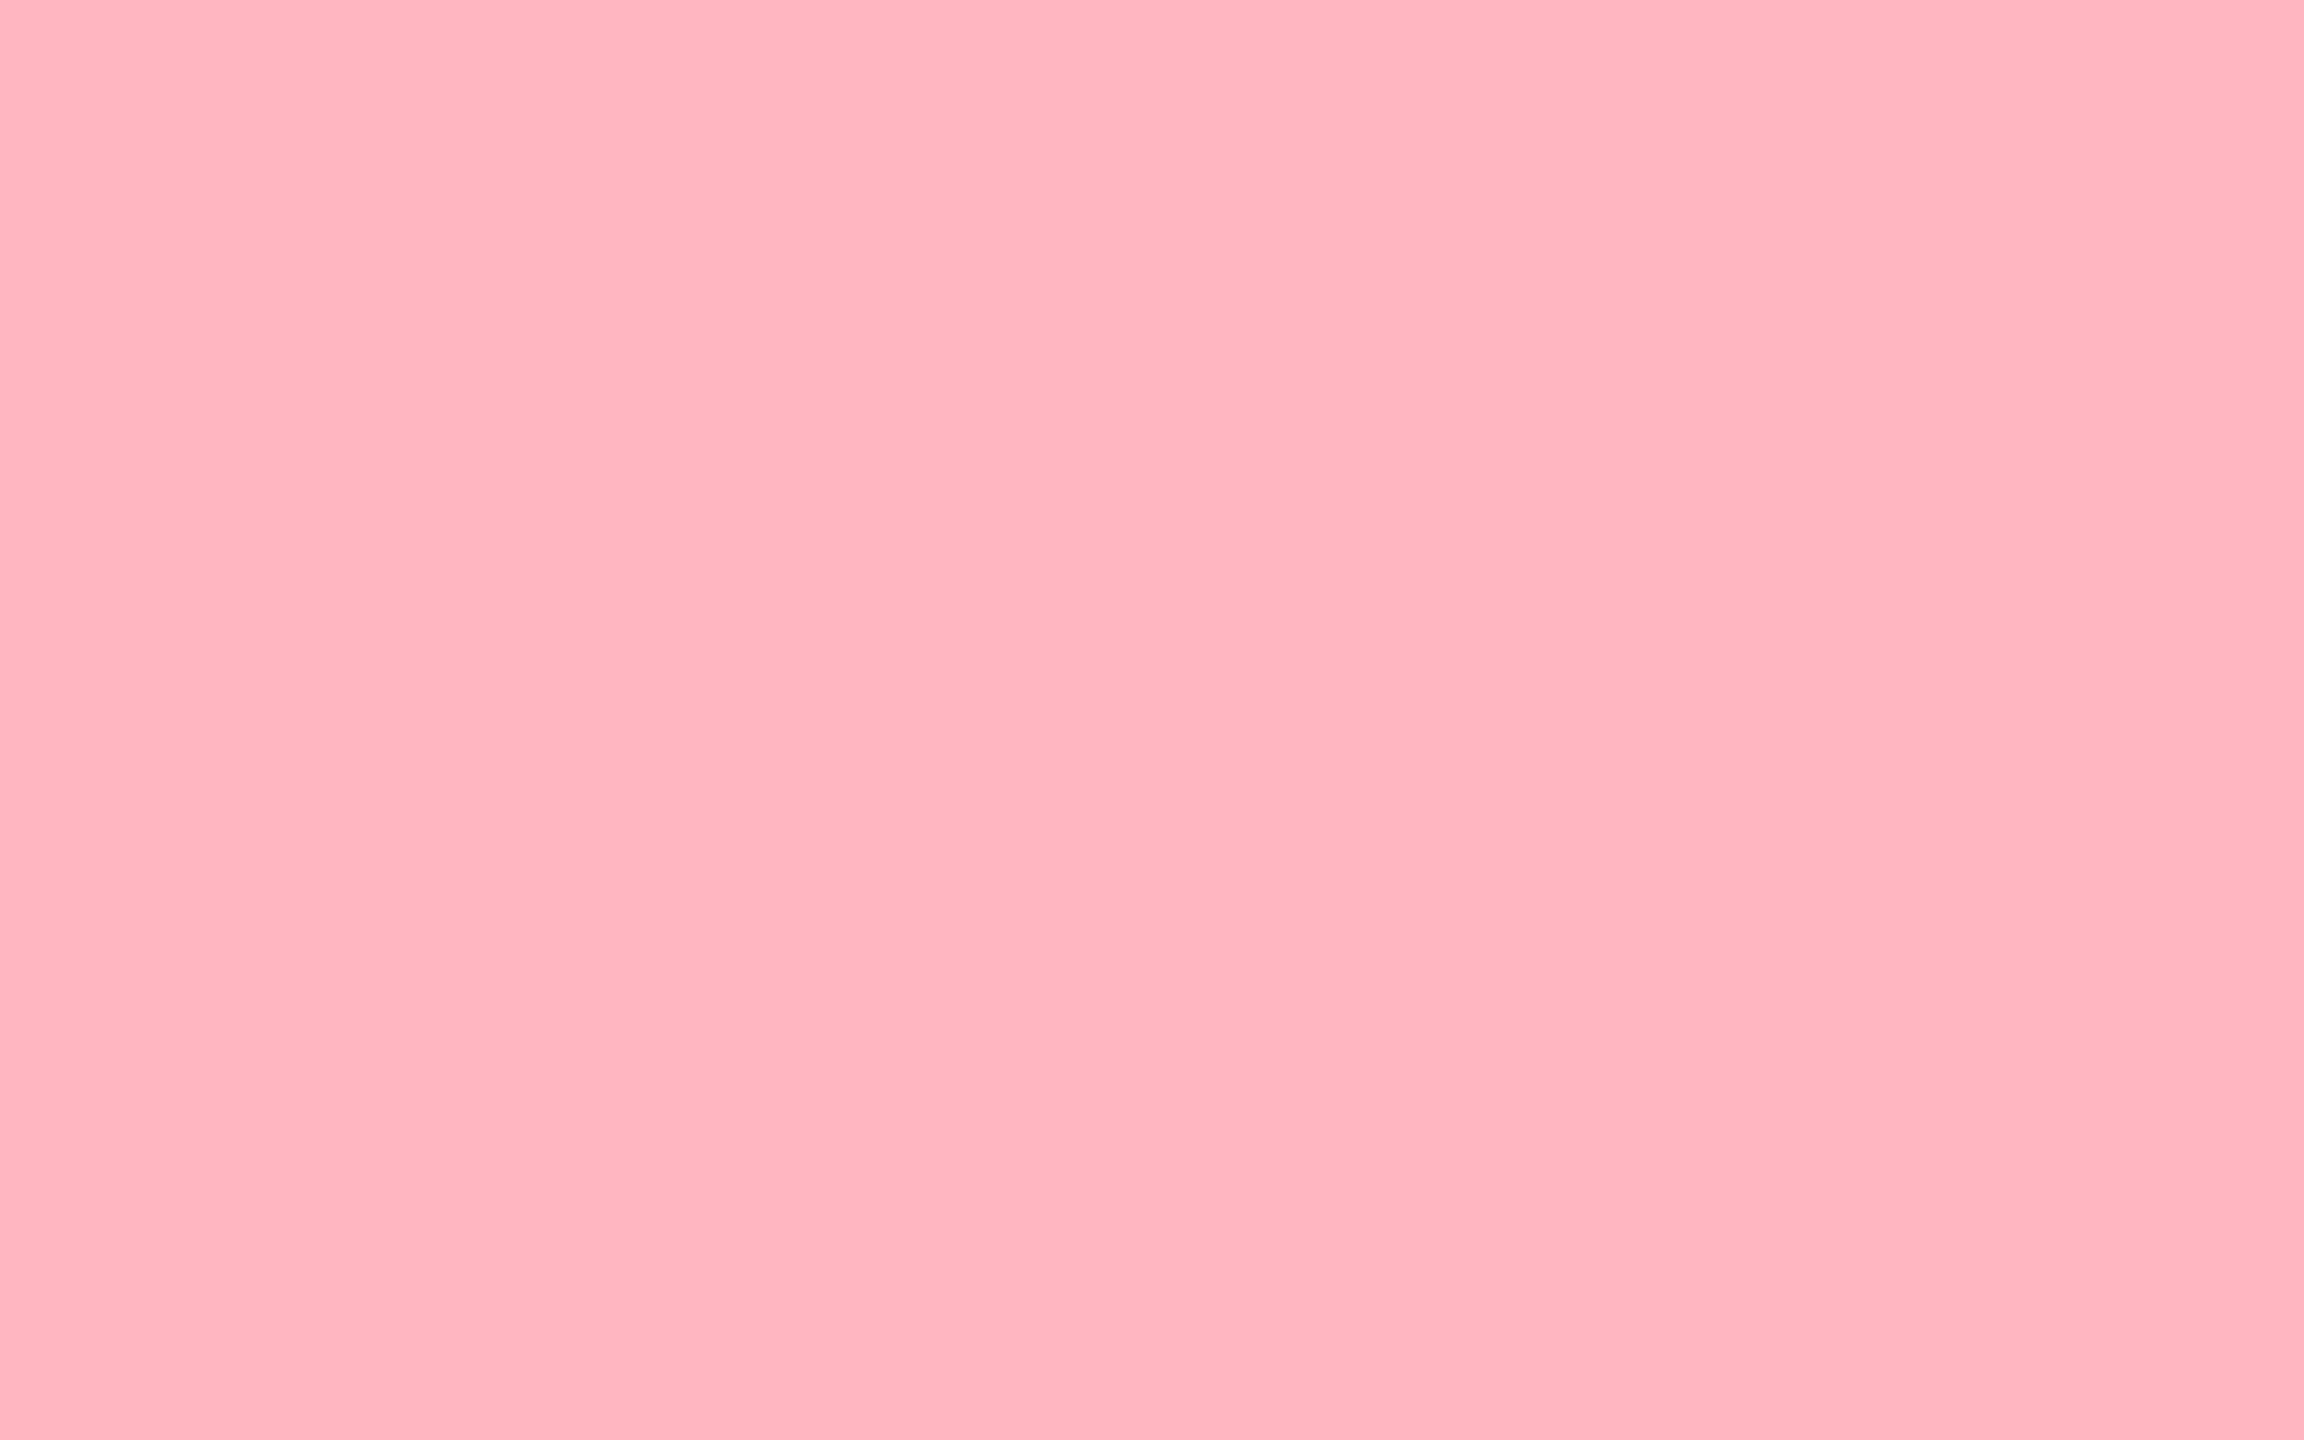 2304x1440 Light Pink Solid Color Background